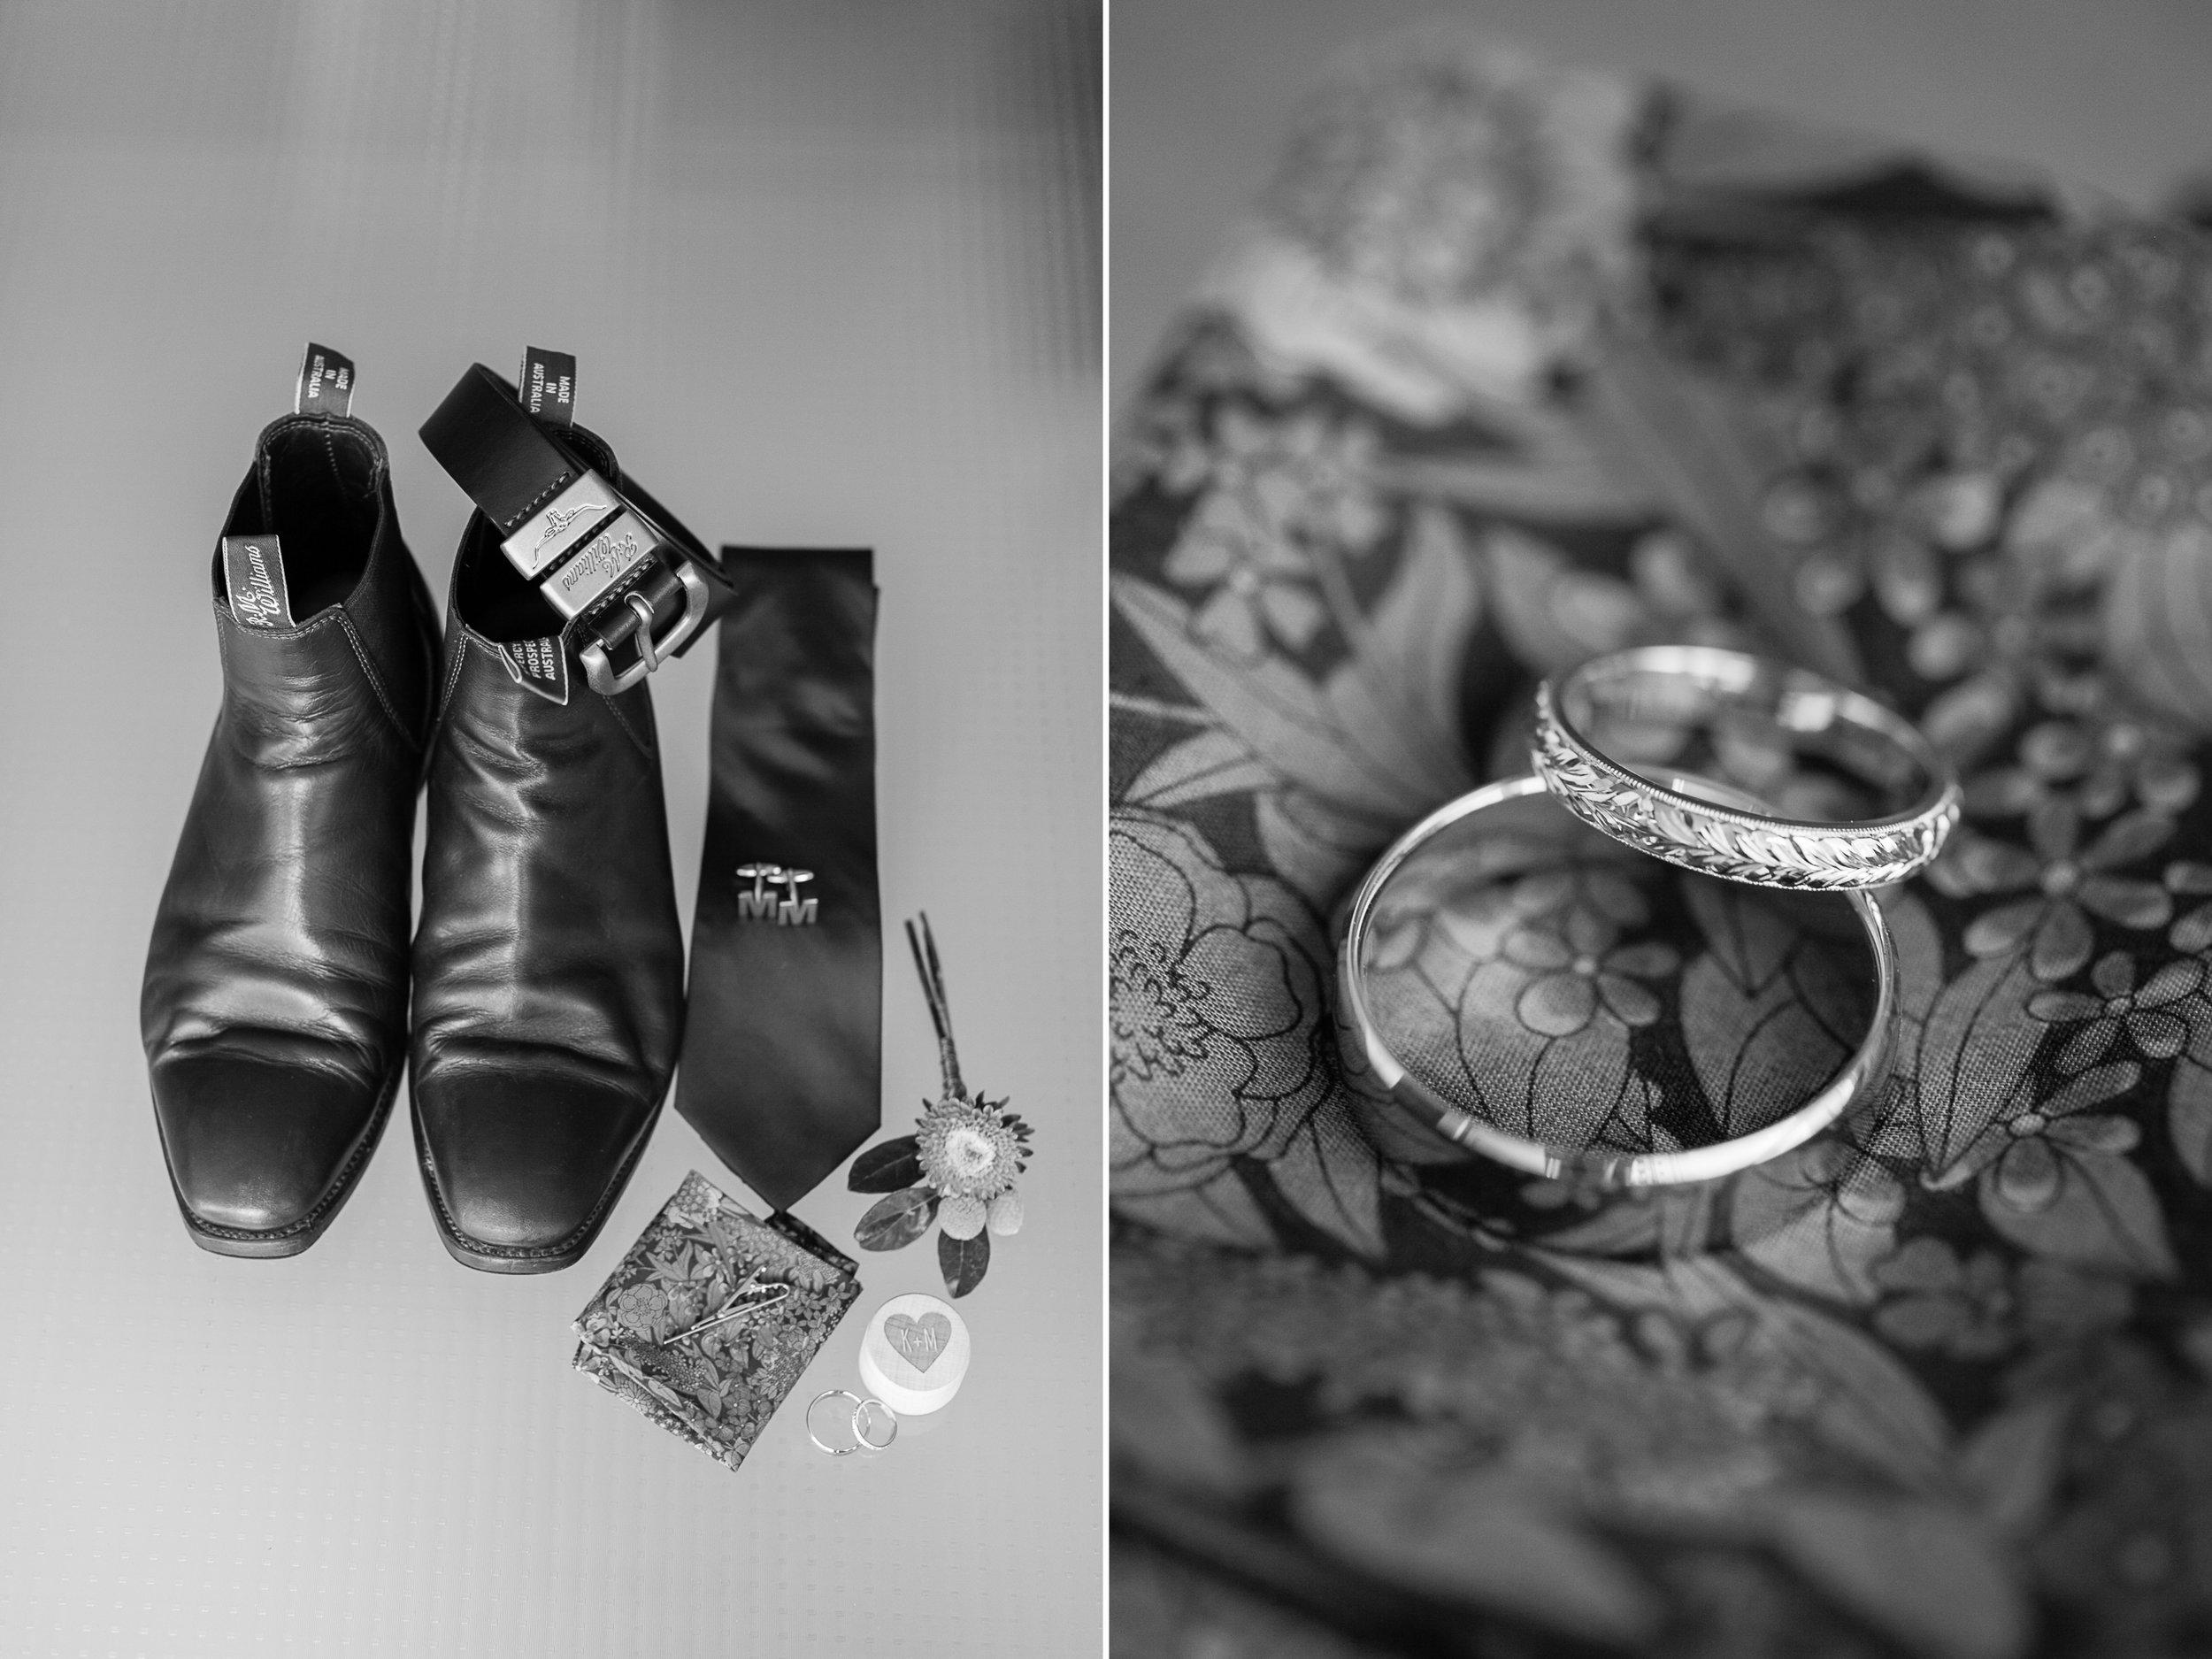 brisbane-city-refinery-wedding-photography-film-13.jpg